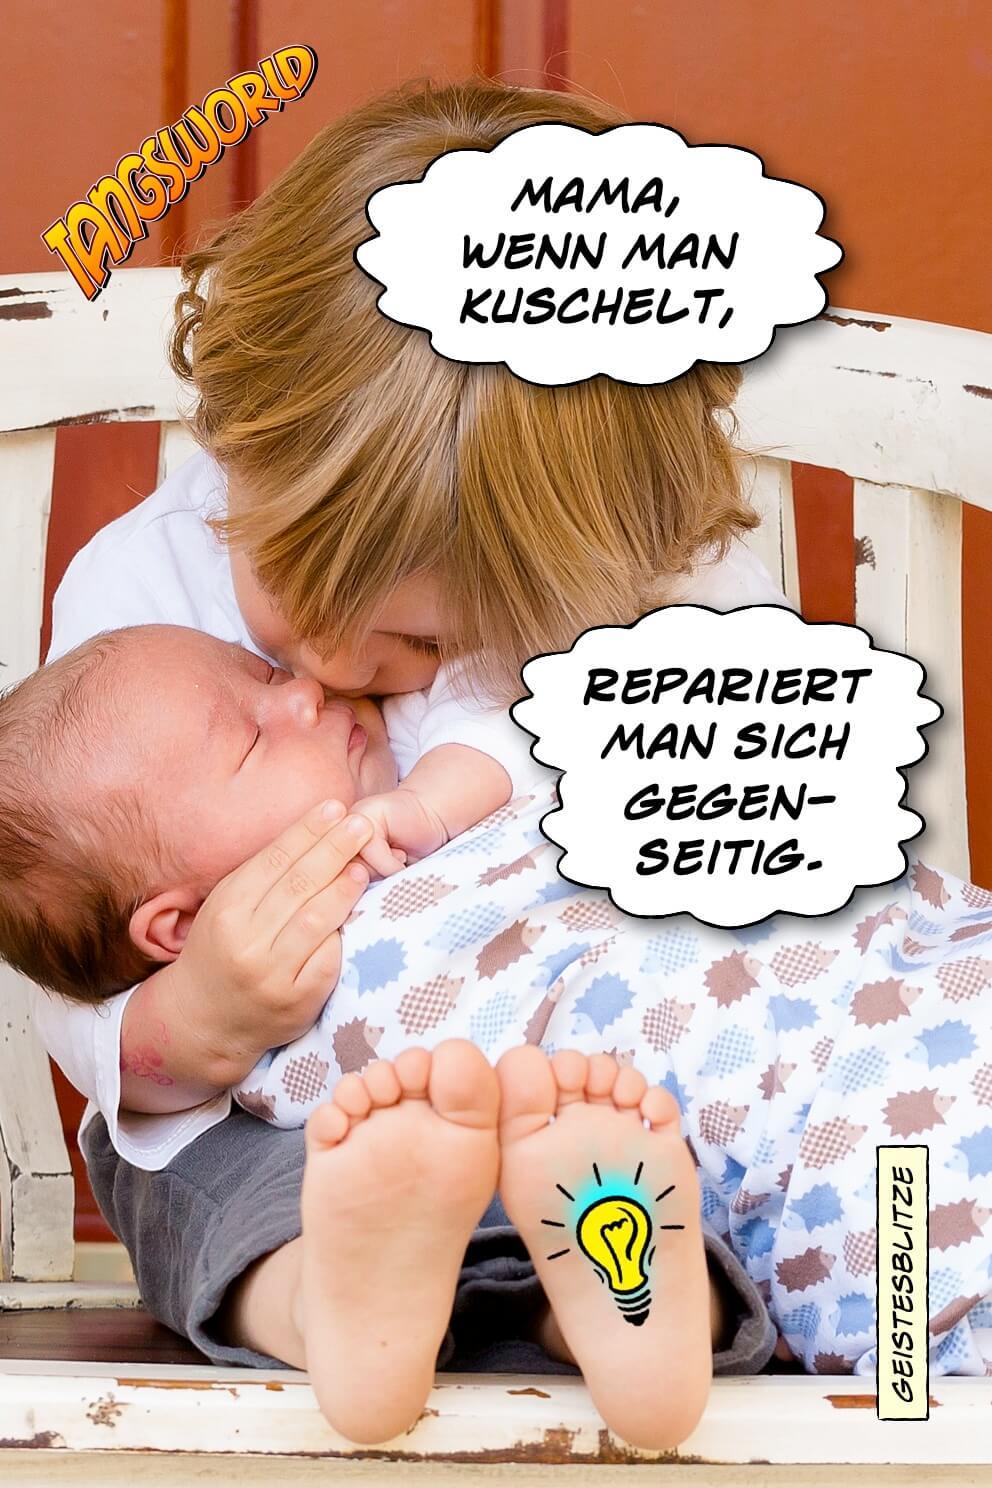 Mama, wenn man kuschelt, repariert man sich gegenseitig. - Geistesblitze